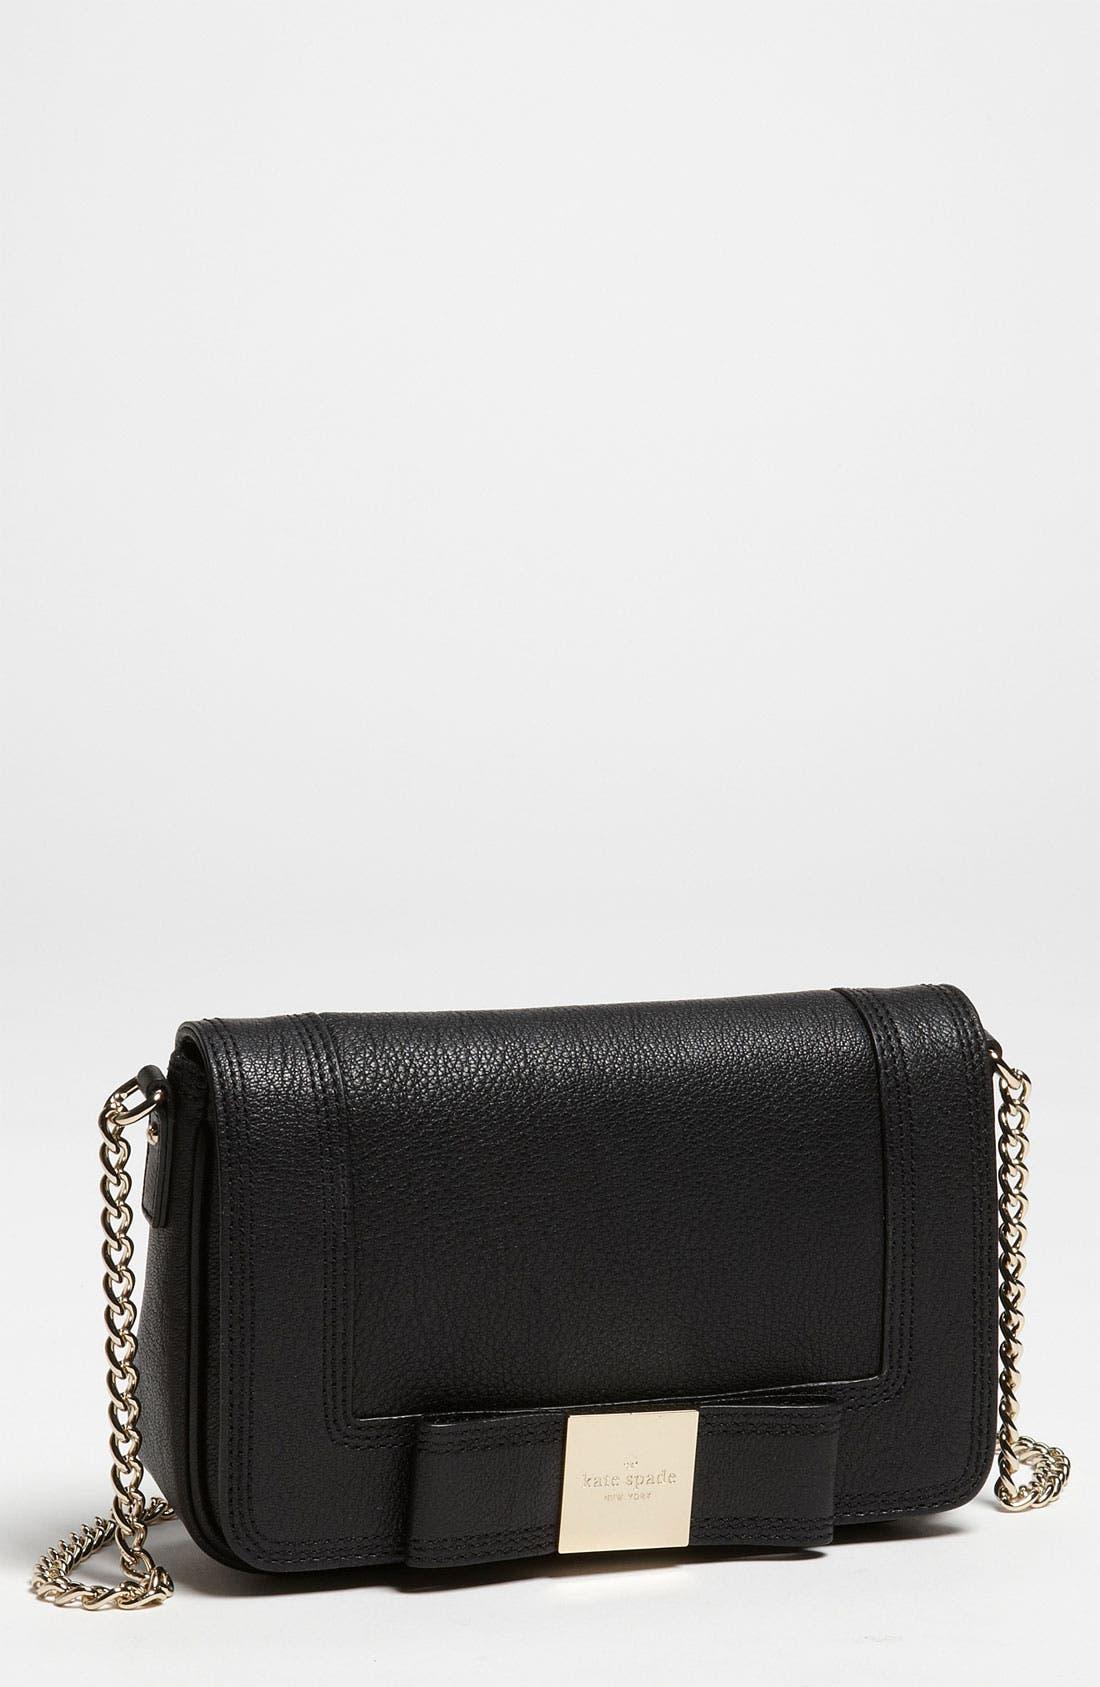 Main Image - kate spade new york 'little kaelin' crossbody bag